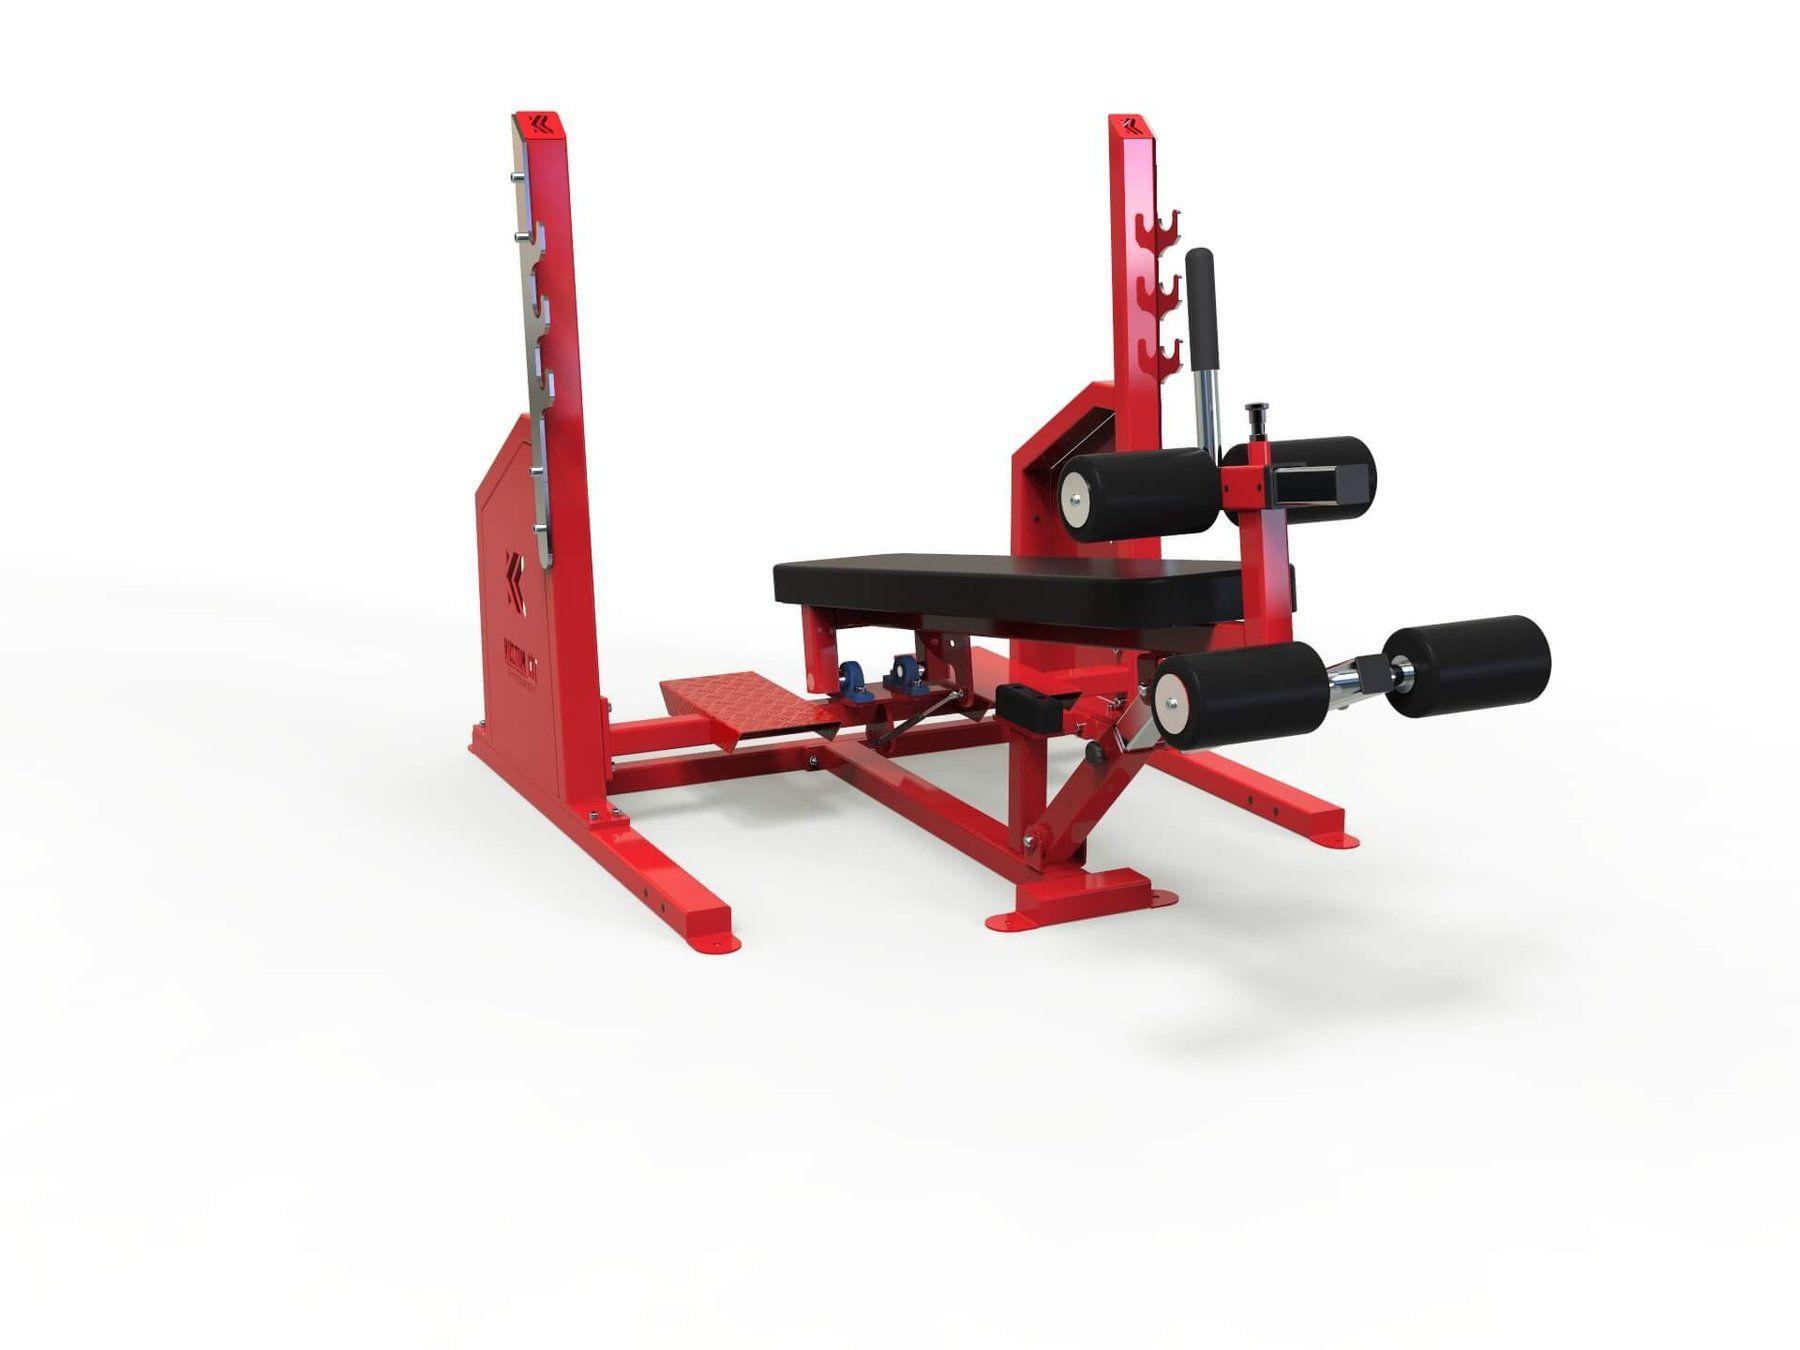 Adjustable Bench Press Price In 2020 Adjustable Bench Press Adjustable Weight Bench Benches For Sale